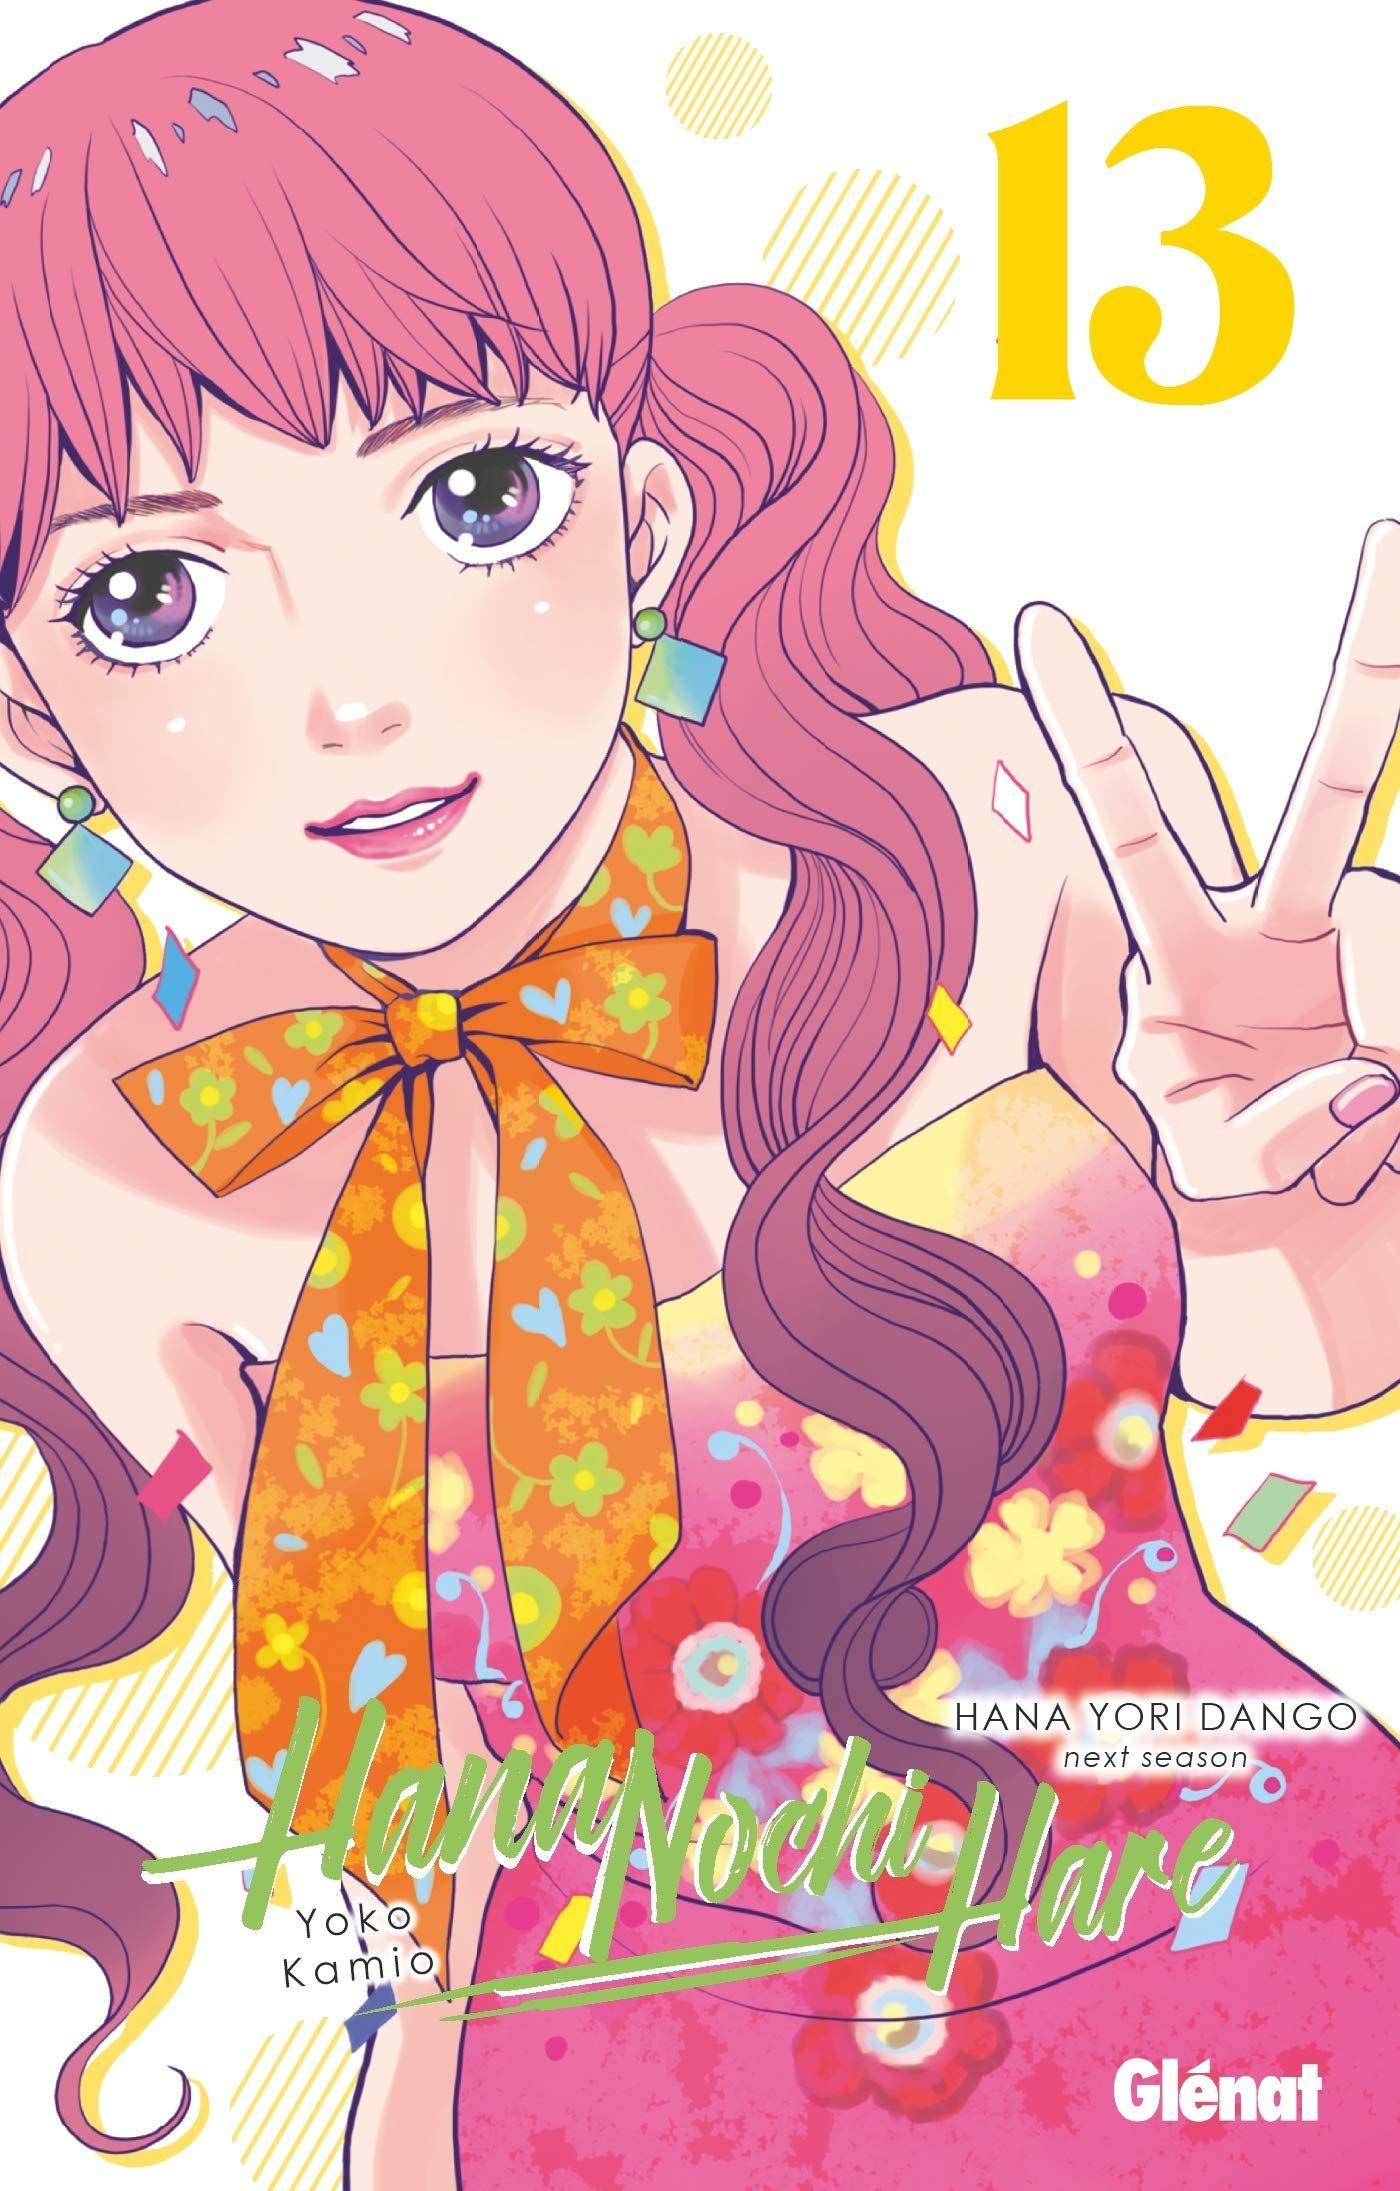 Sortie Manga au Québec JUIN 2021 Hana-nochi-hare-13-glenat